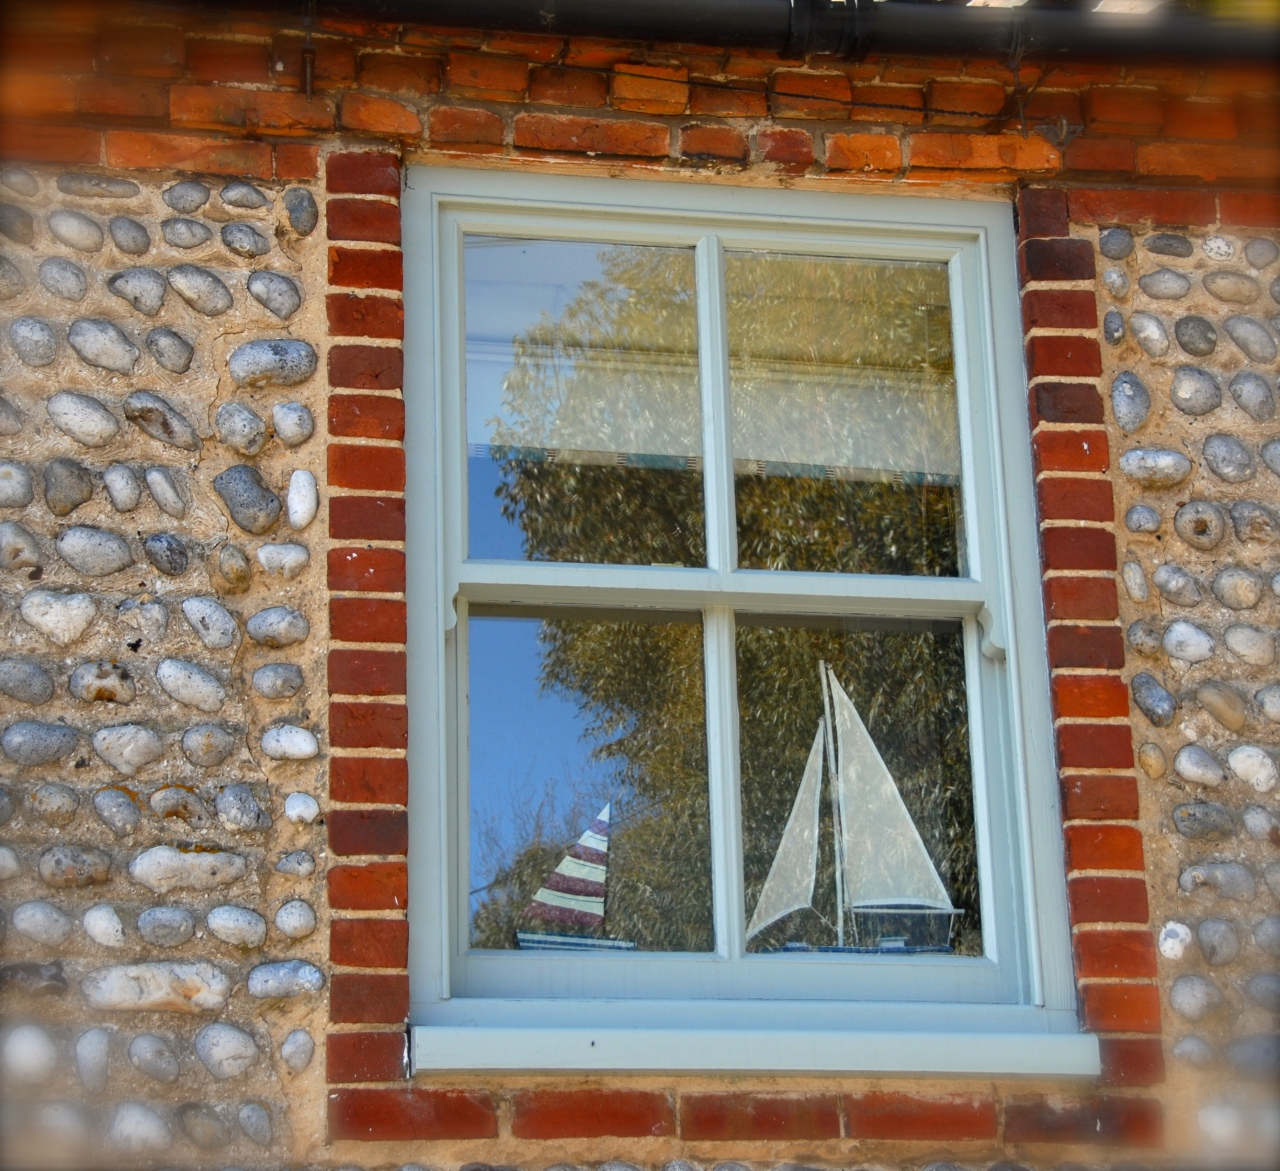 Window on The Fairstead, Cley next the Sea, Photo: Hanne Siebers